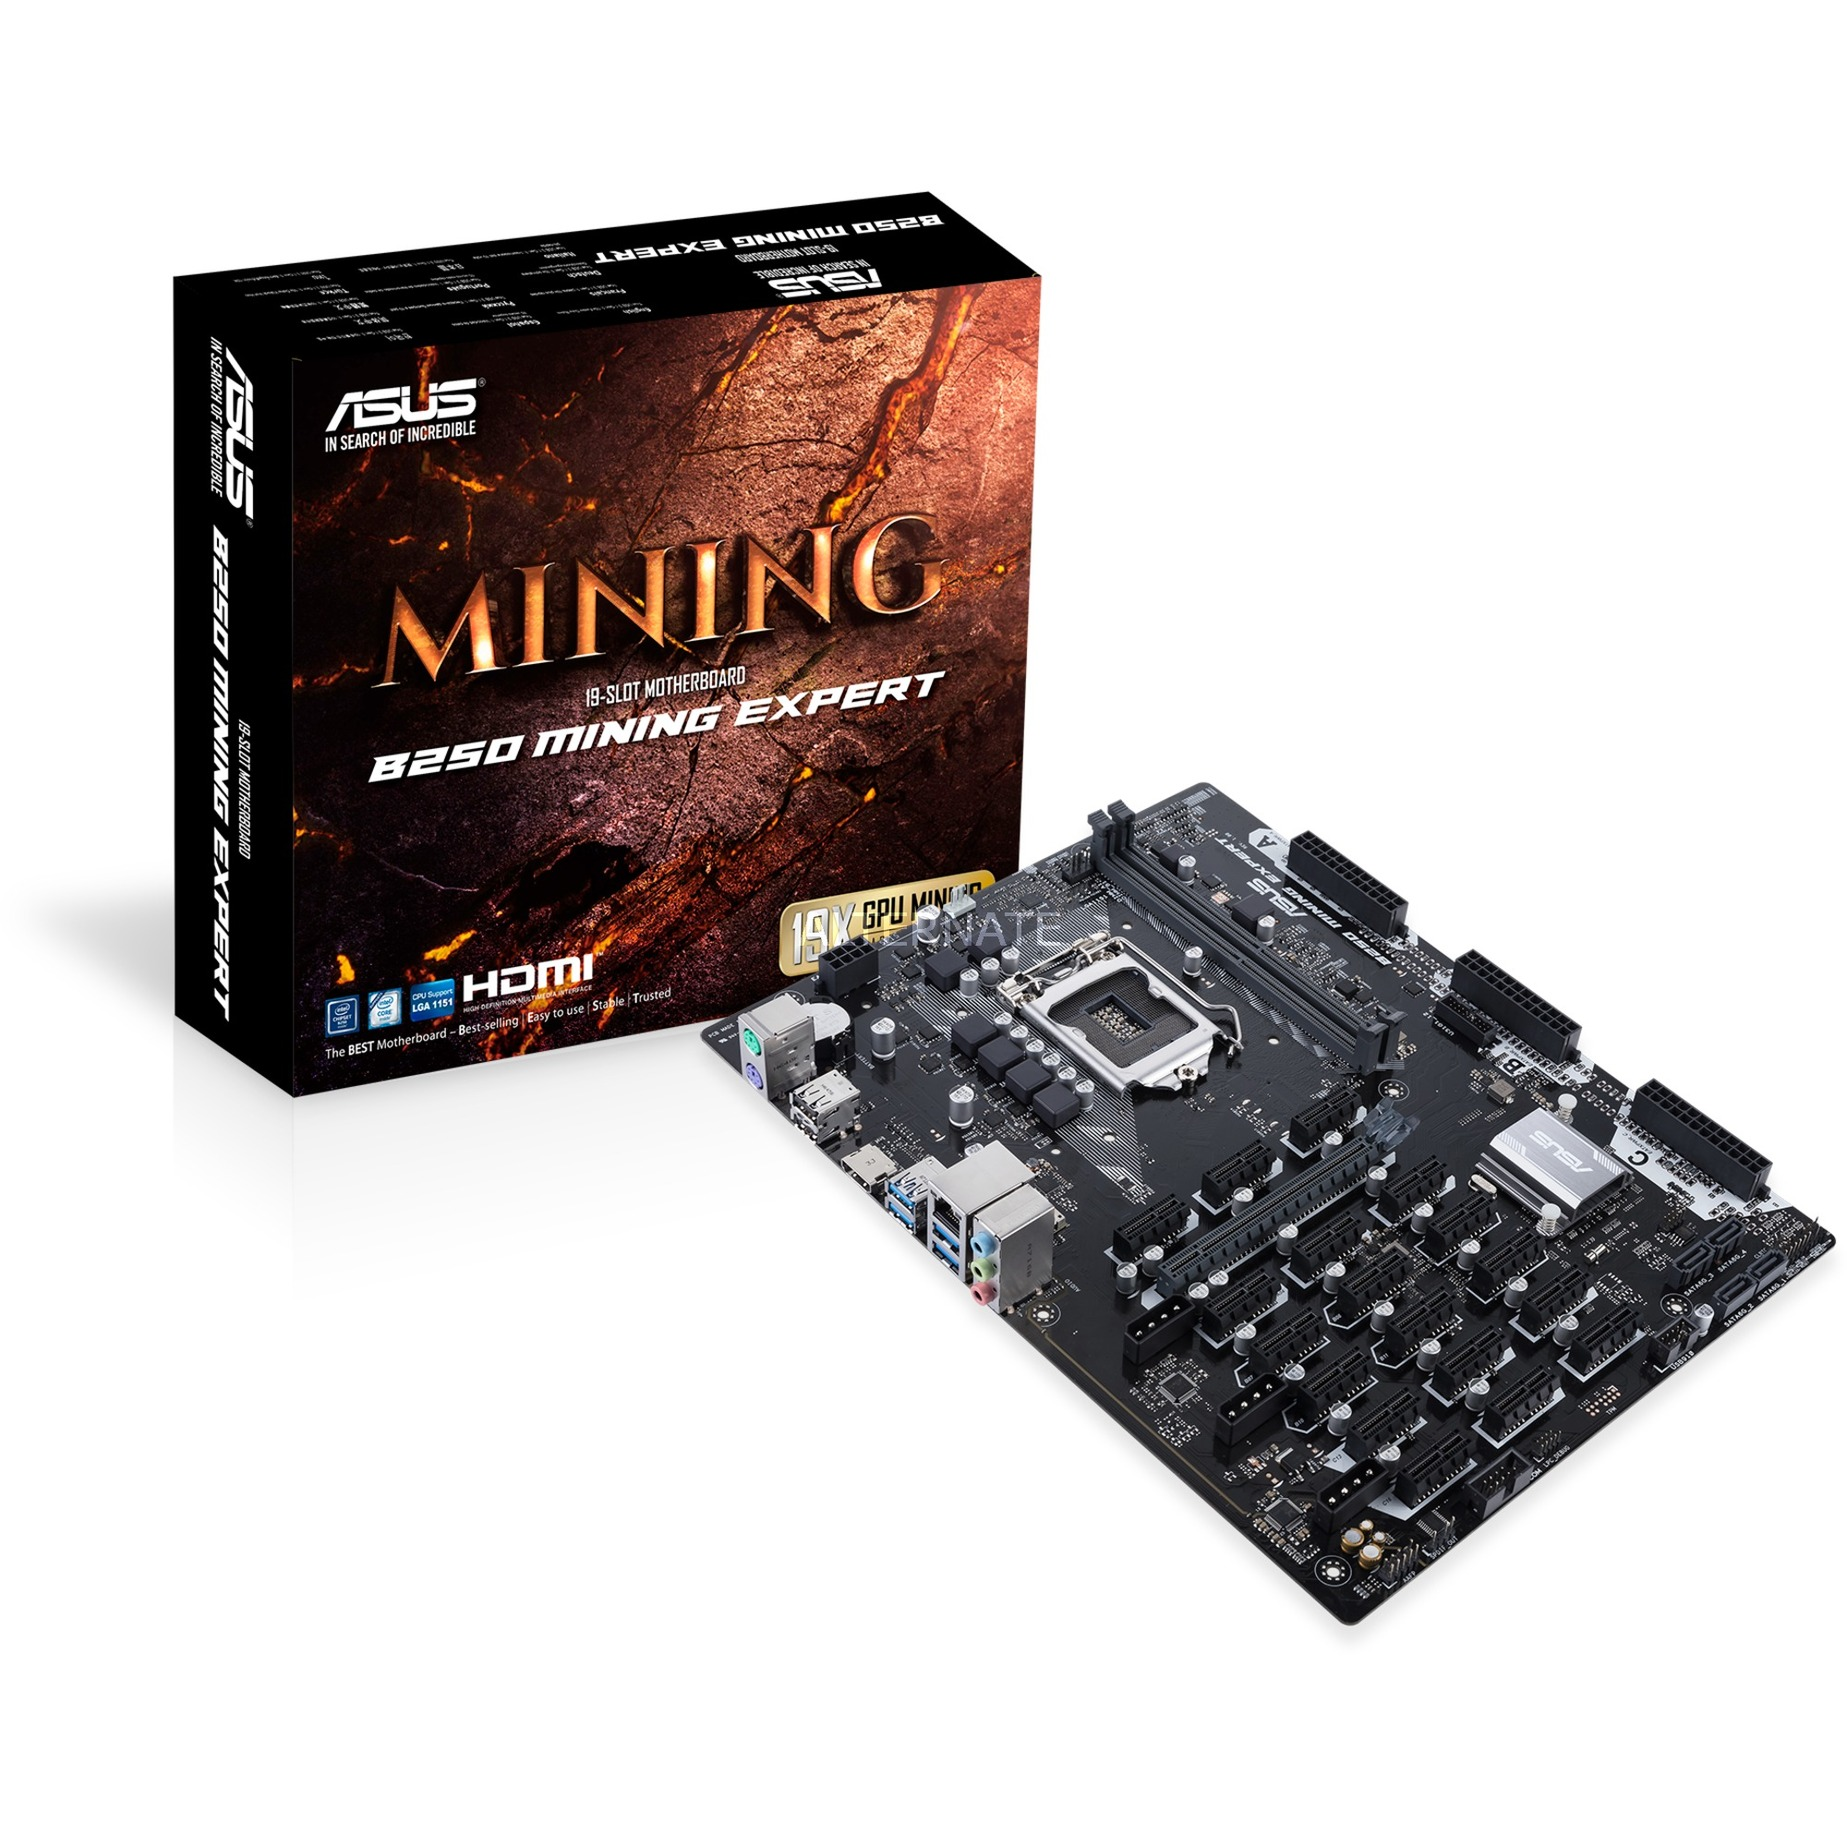 B250 MINING EXPERT LGA 1151 (Zócalo H4) Intel B250 ATX, Placa base